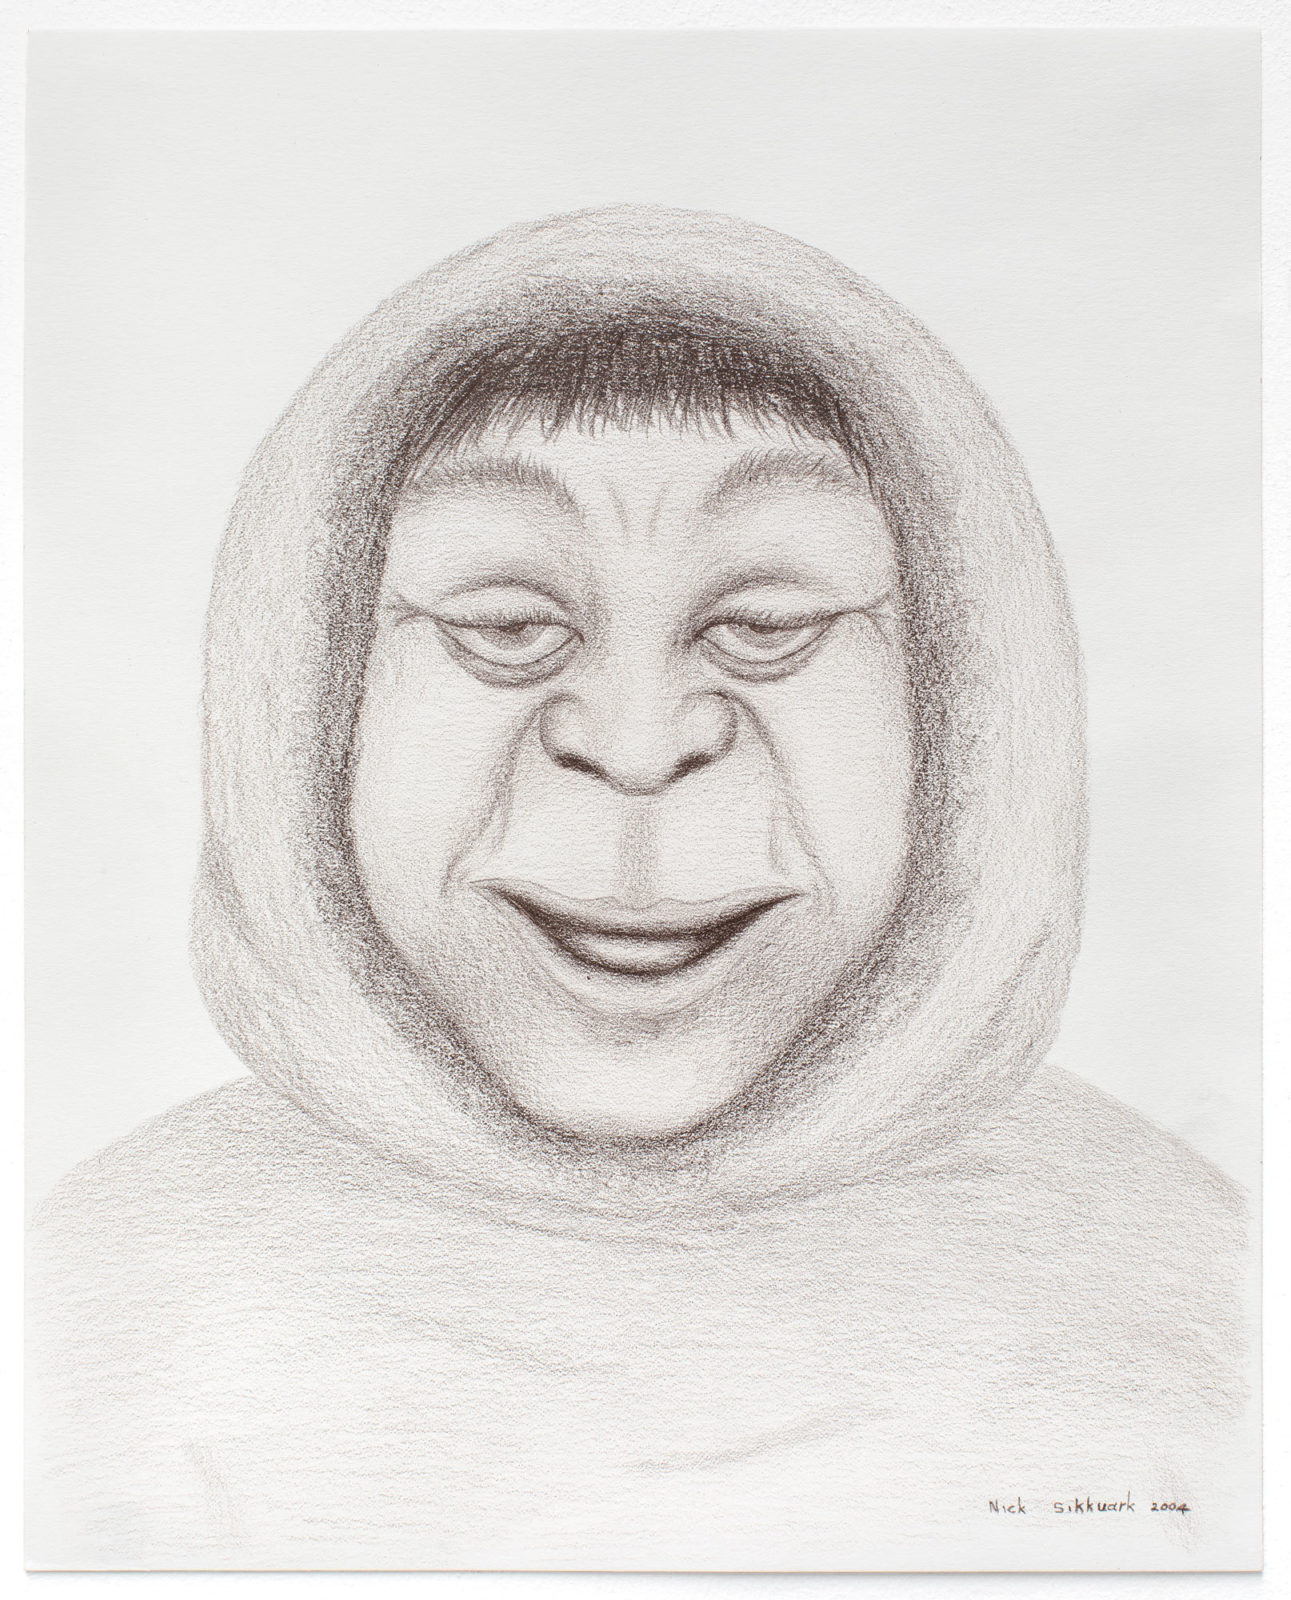 Nick Sikkuark - untitled (portrait)